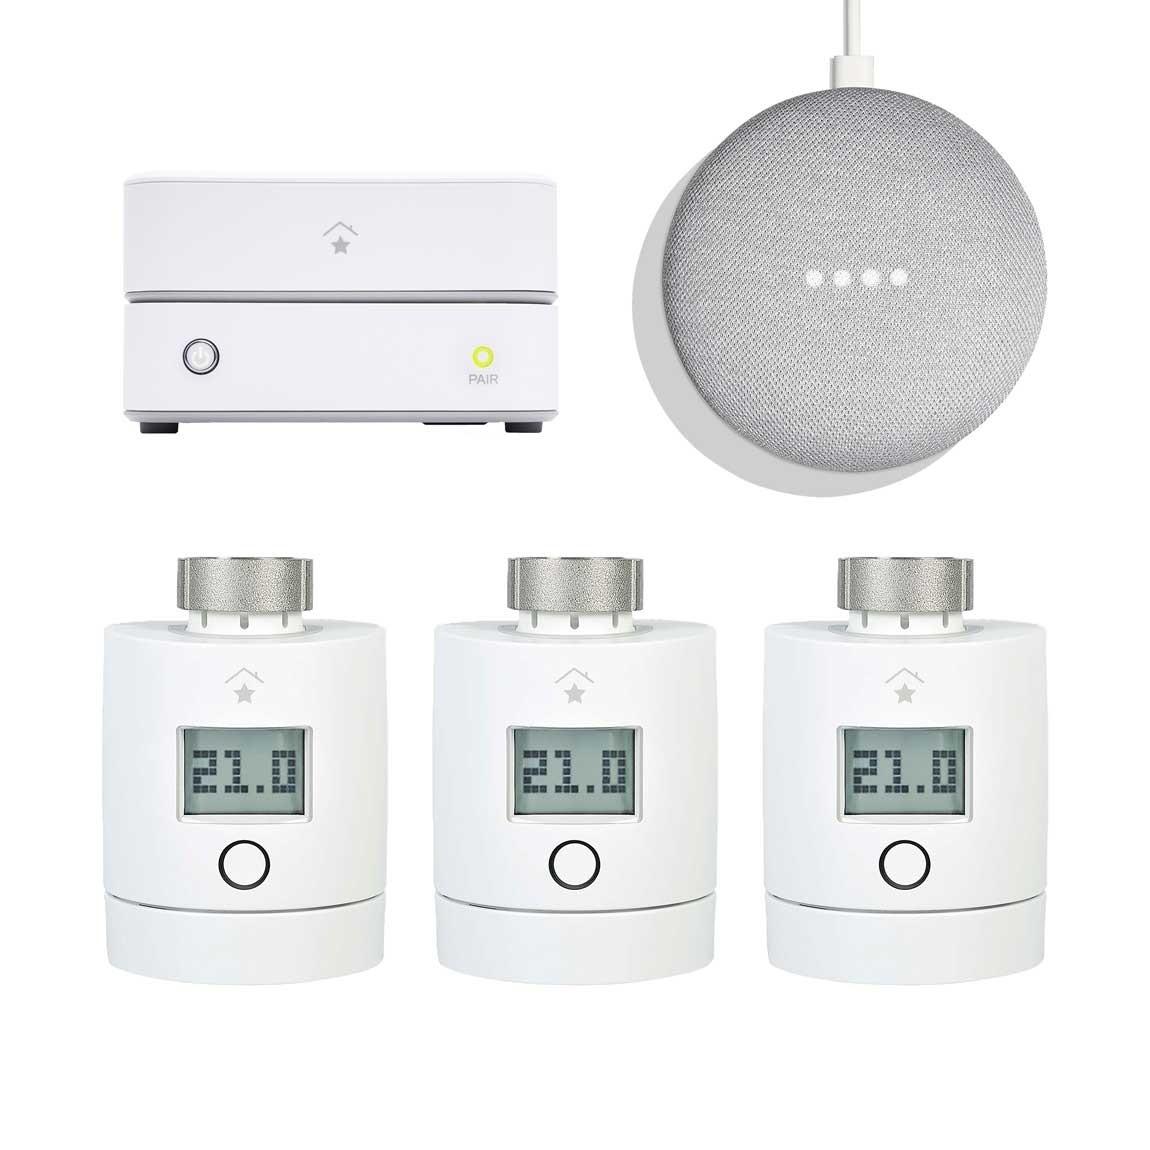 innogy SmartHome Starter Set Heizung mit 3 Thermostaten + gratis Google Home Mini